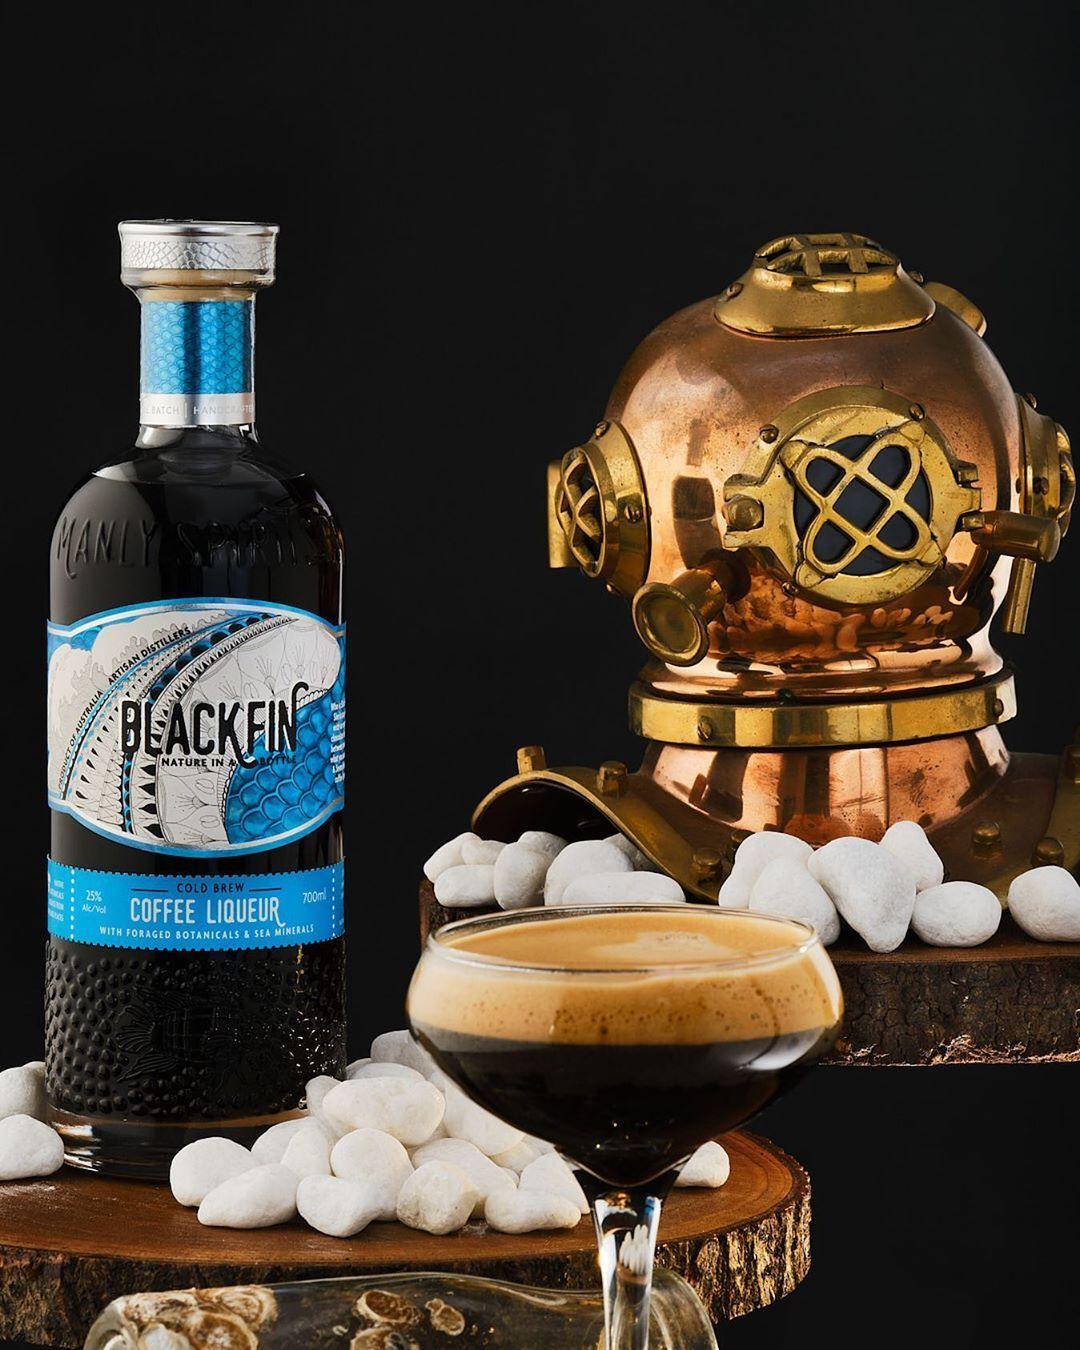 #manlyspirits #fujixaus #fujifilm #splashphotography #mainfocusproductions #gin #cocktails #drinks #bar #cocktail #vodka #bartender #mixology #drink #gintonic #ginandtonic #blackfin #espressomartini #whiskey #instagood #party #ginlovers #alcohol #whisky  #ginoclock #tequila #liquor #productphotography #productshoot #photographytricks